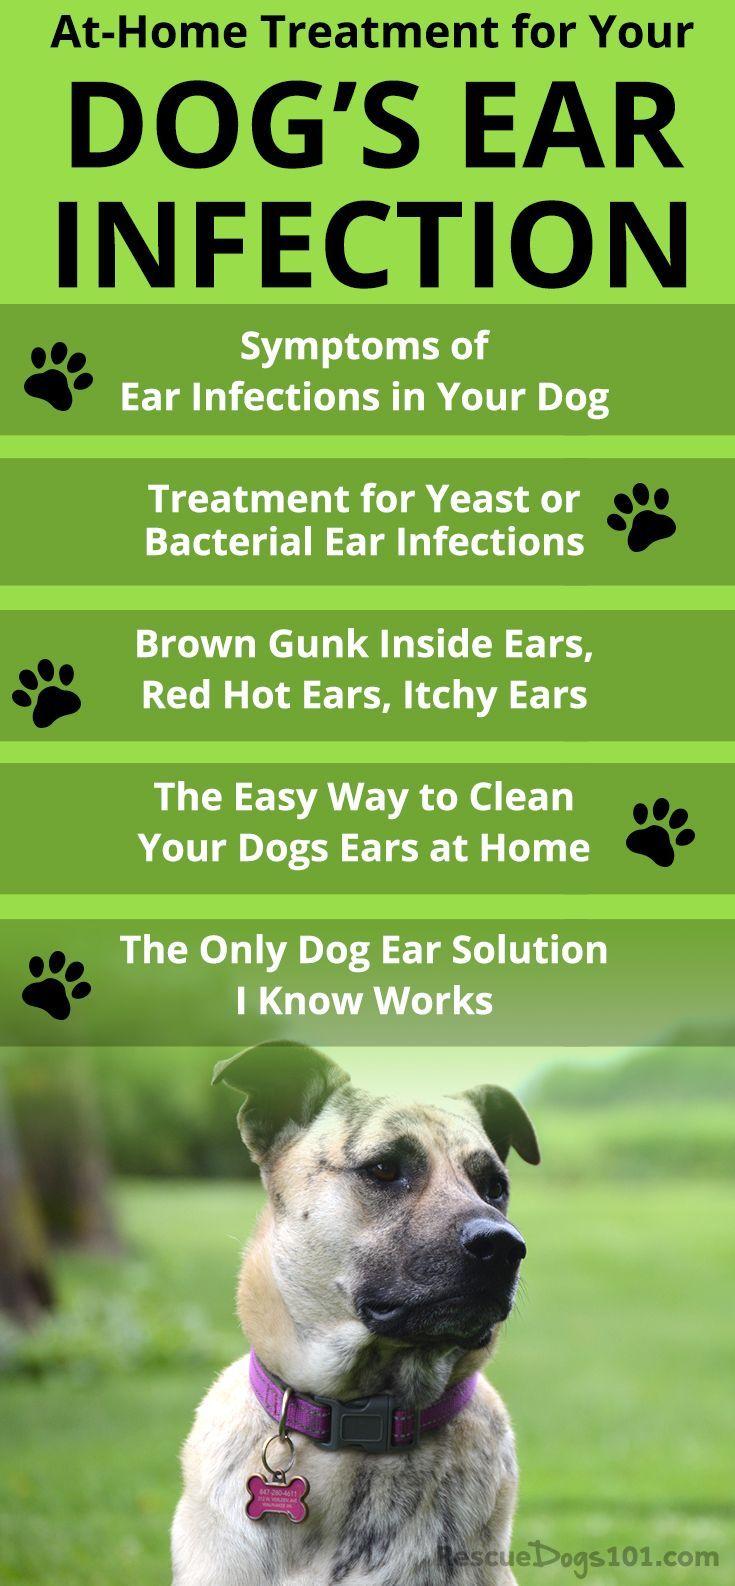 f06ceefd04e2d00c56bc64a48d5e4de2 - How To Get Rid Of Yeast In My Dog